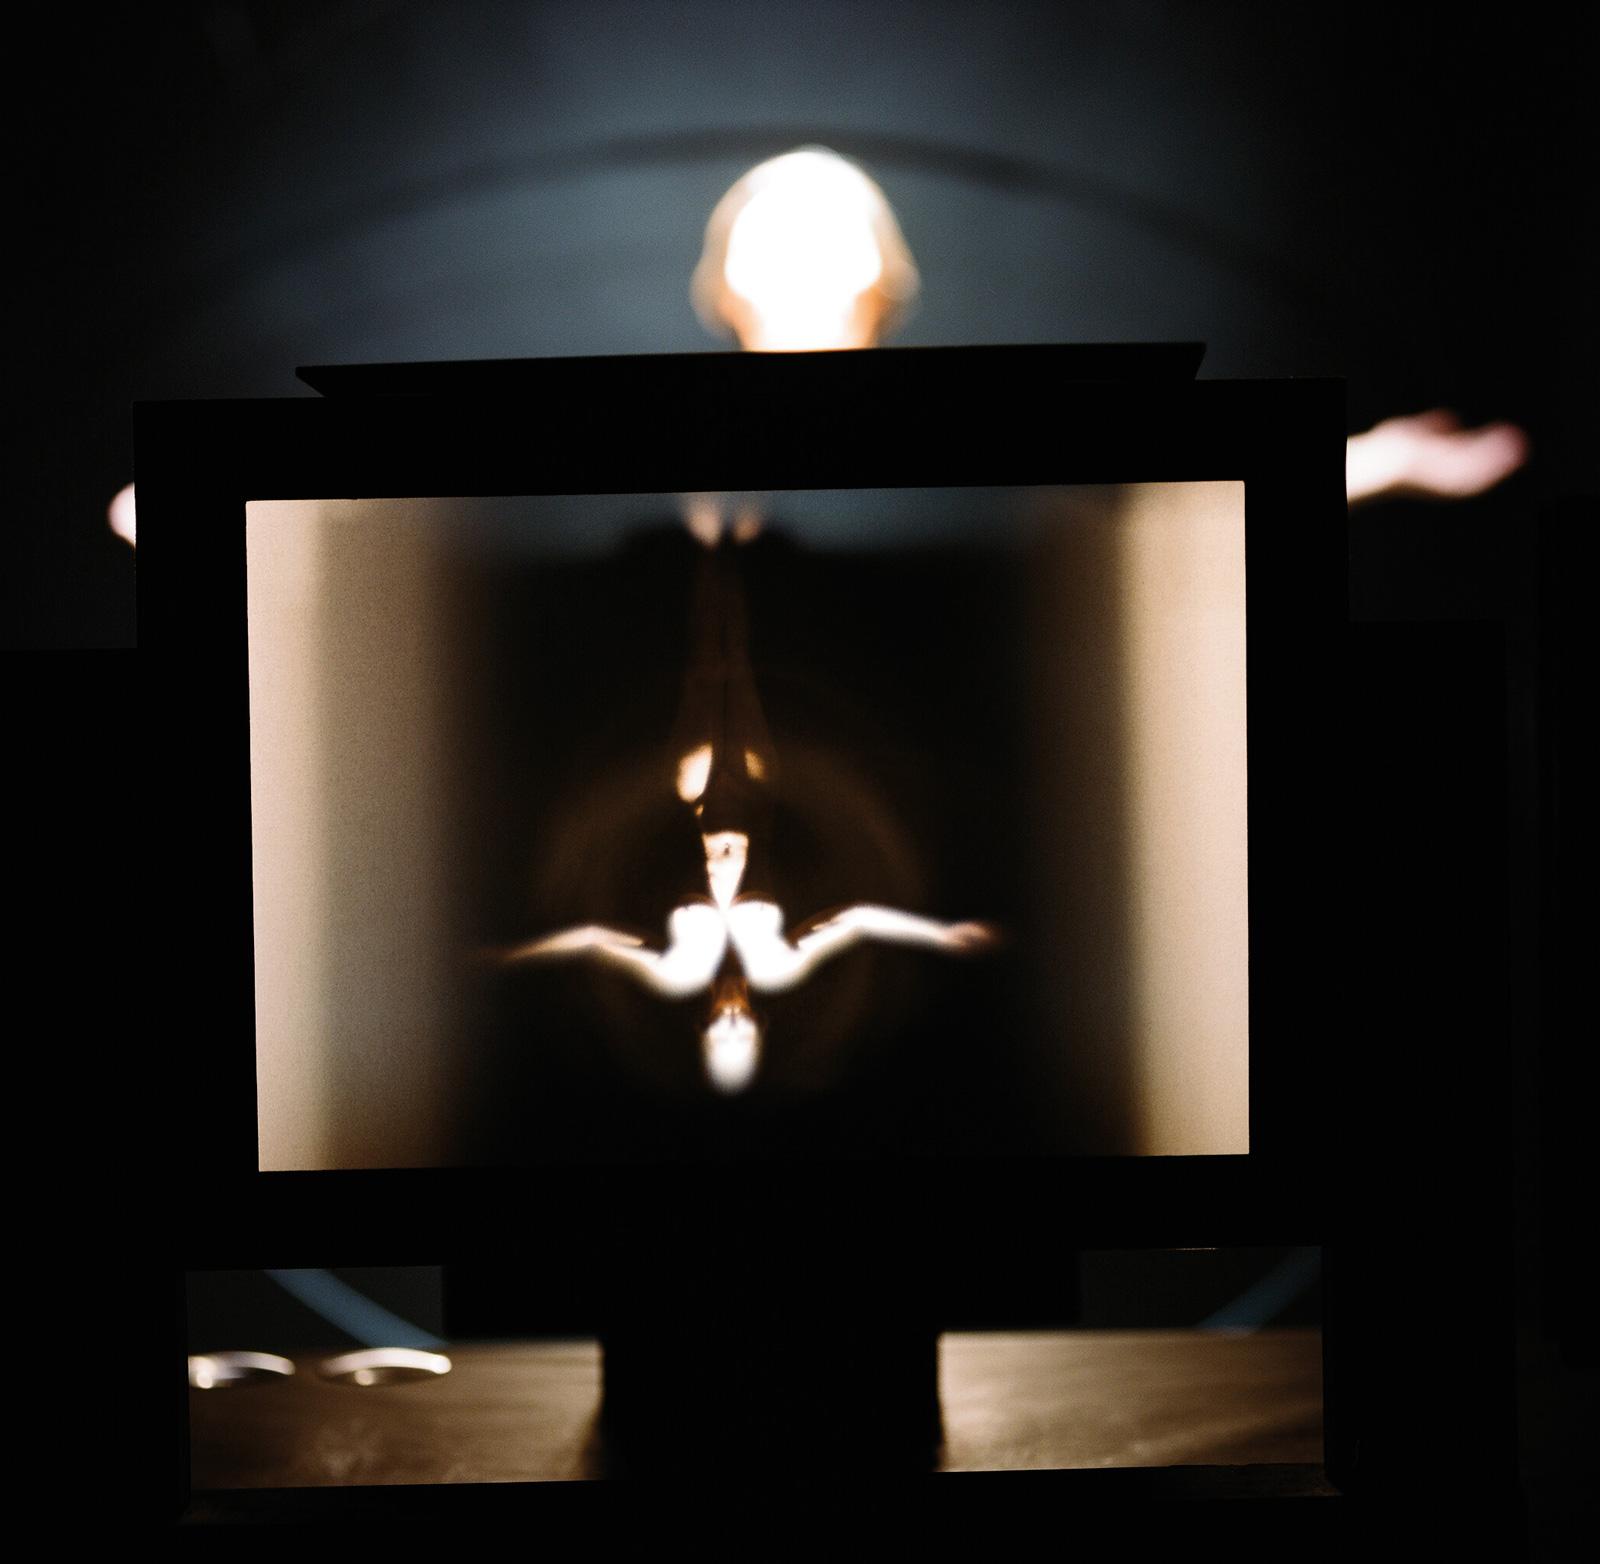 LA SEMILLA DE LA IMAGEN XVI serie I. Fotografía analógica, 2009